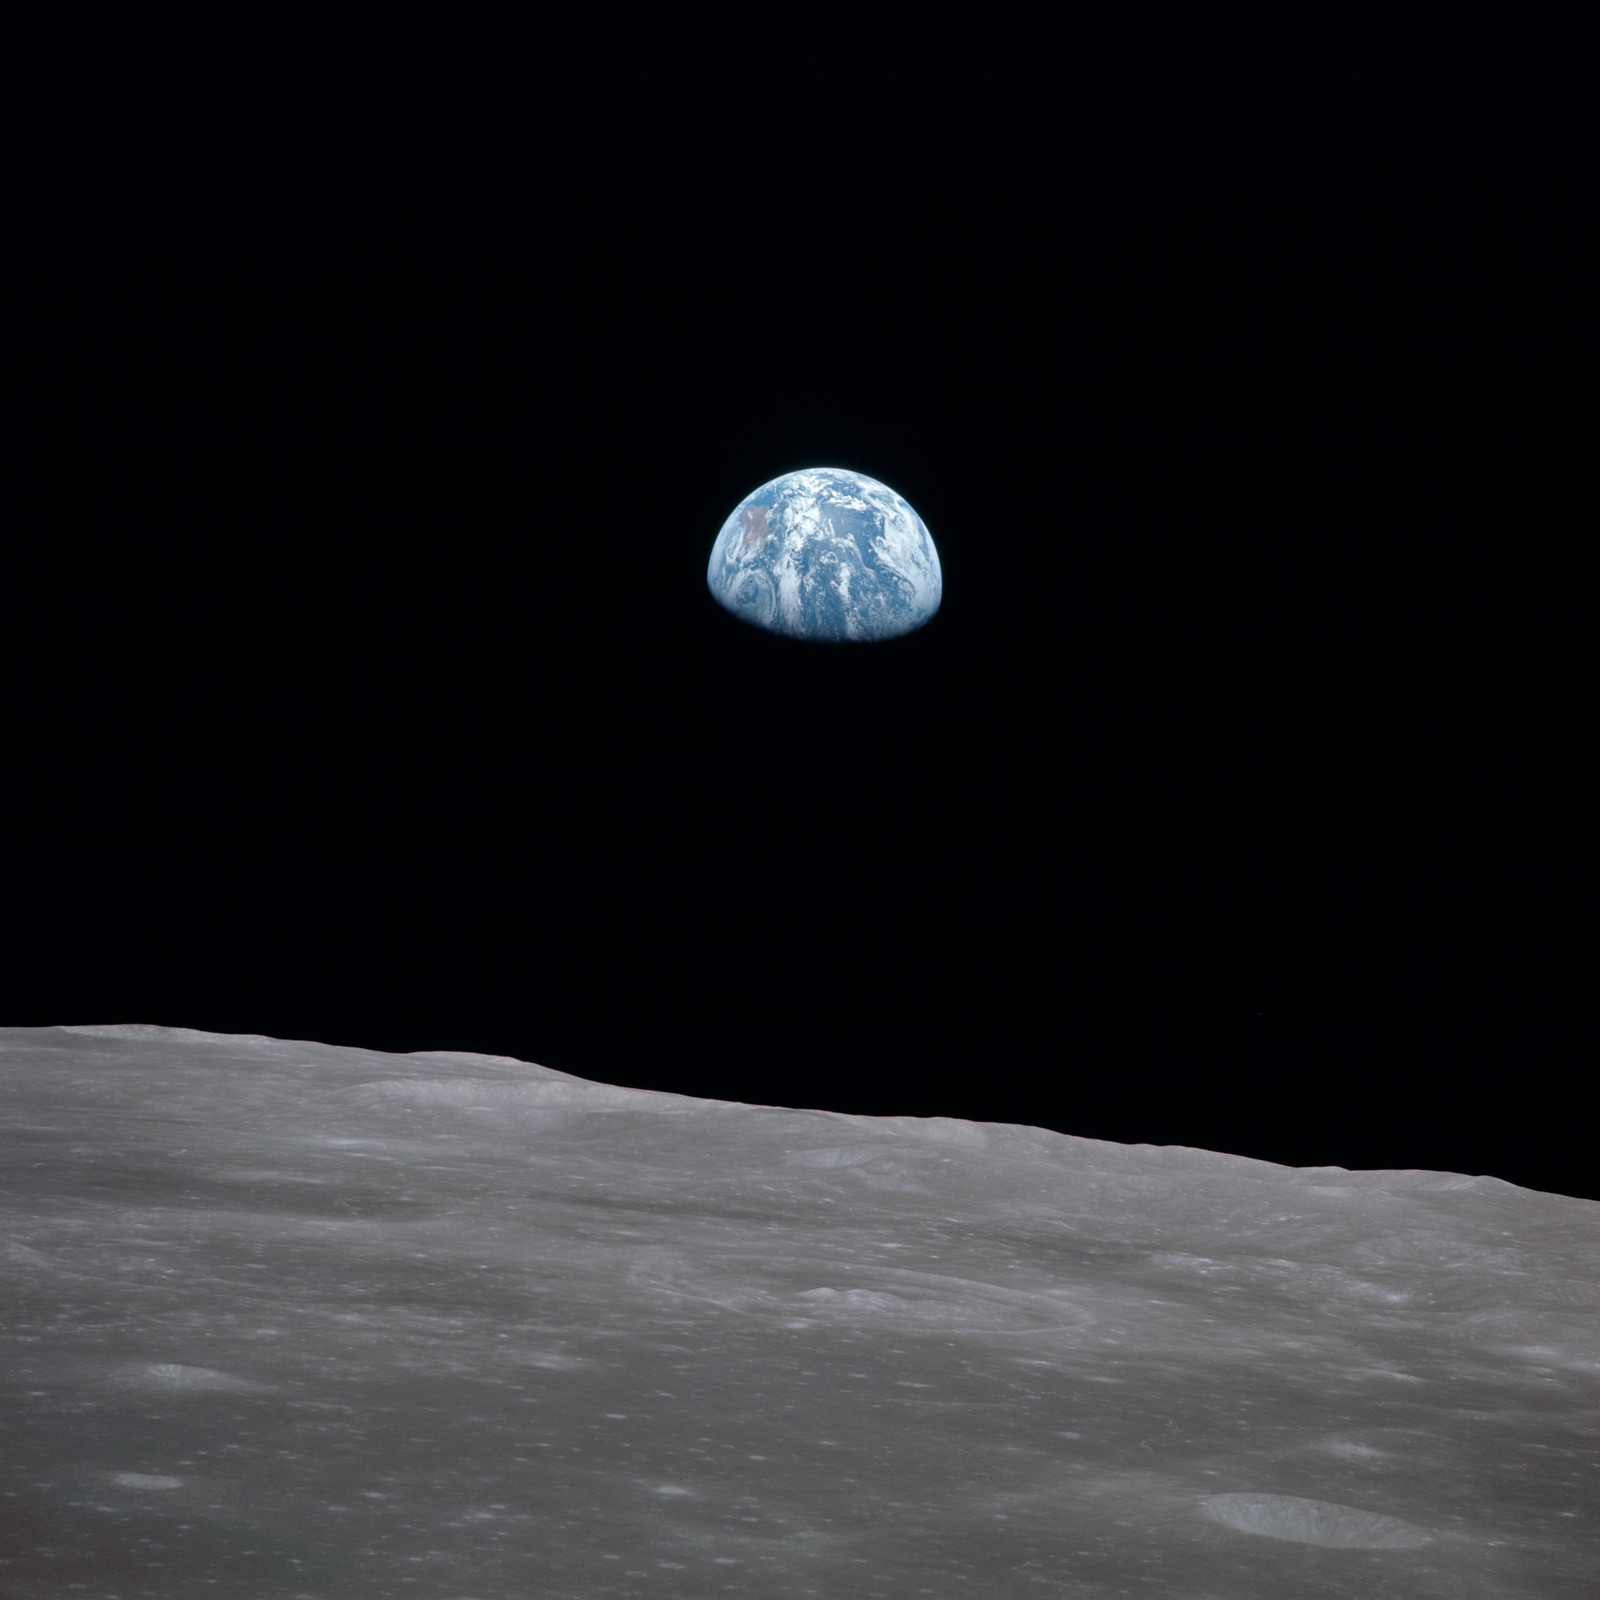 AS11-44-6564 - Apollo 11 - Apollo 11 Mission image - View of moon limb, with Earth on the horizon, Mare Smythii Region